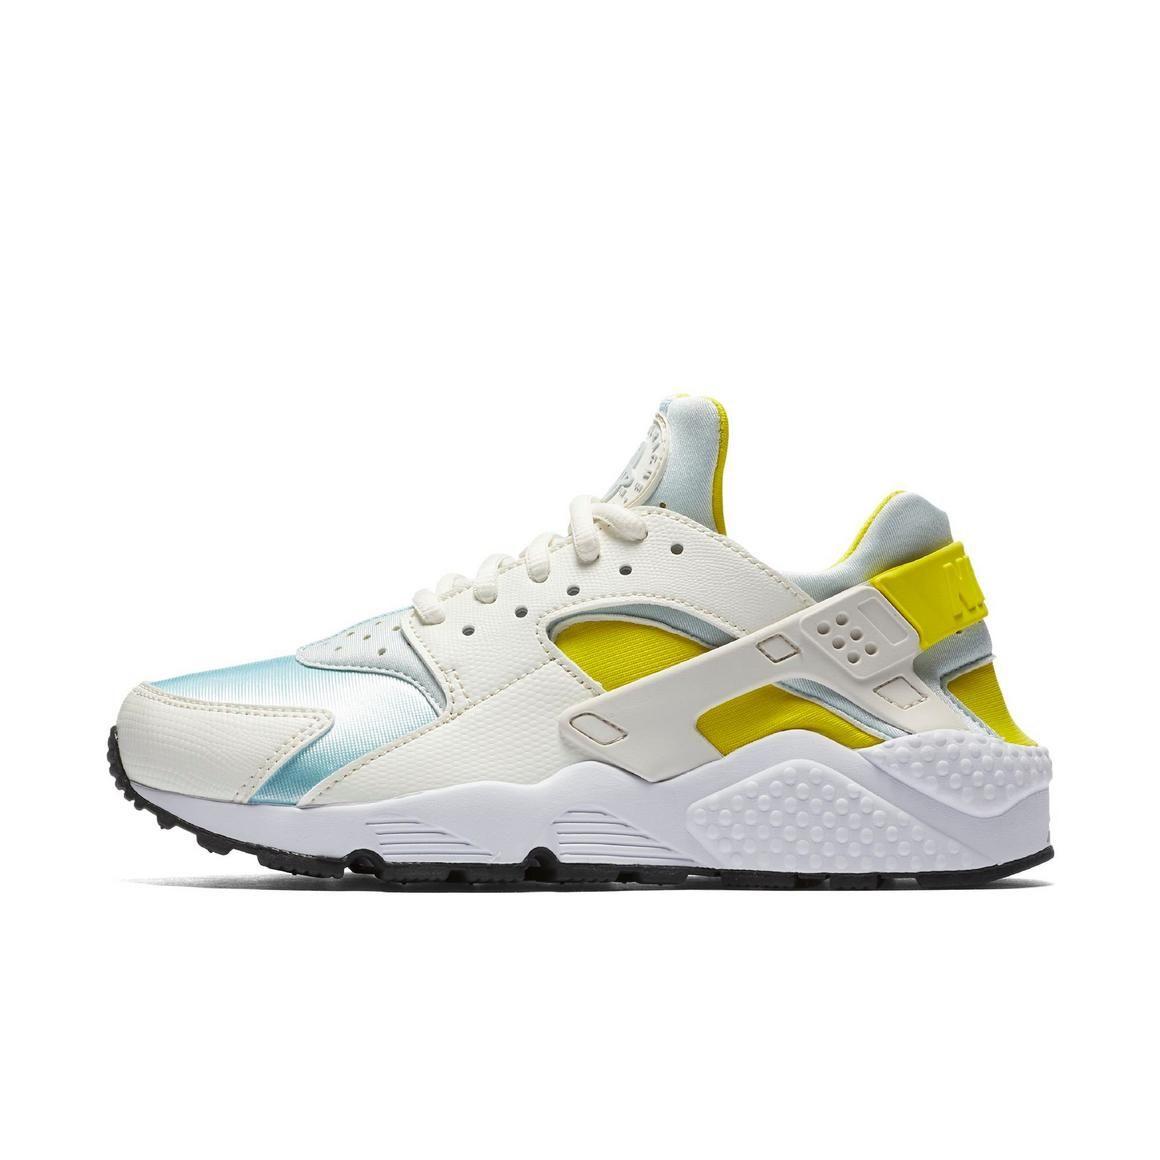 "Nike Air Huarache Run ""White/Blue/Yellow"" Women's Casual"